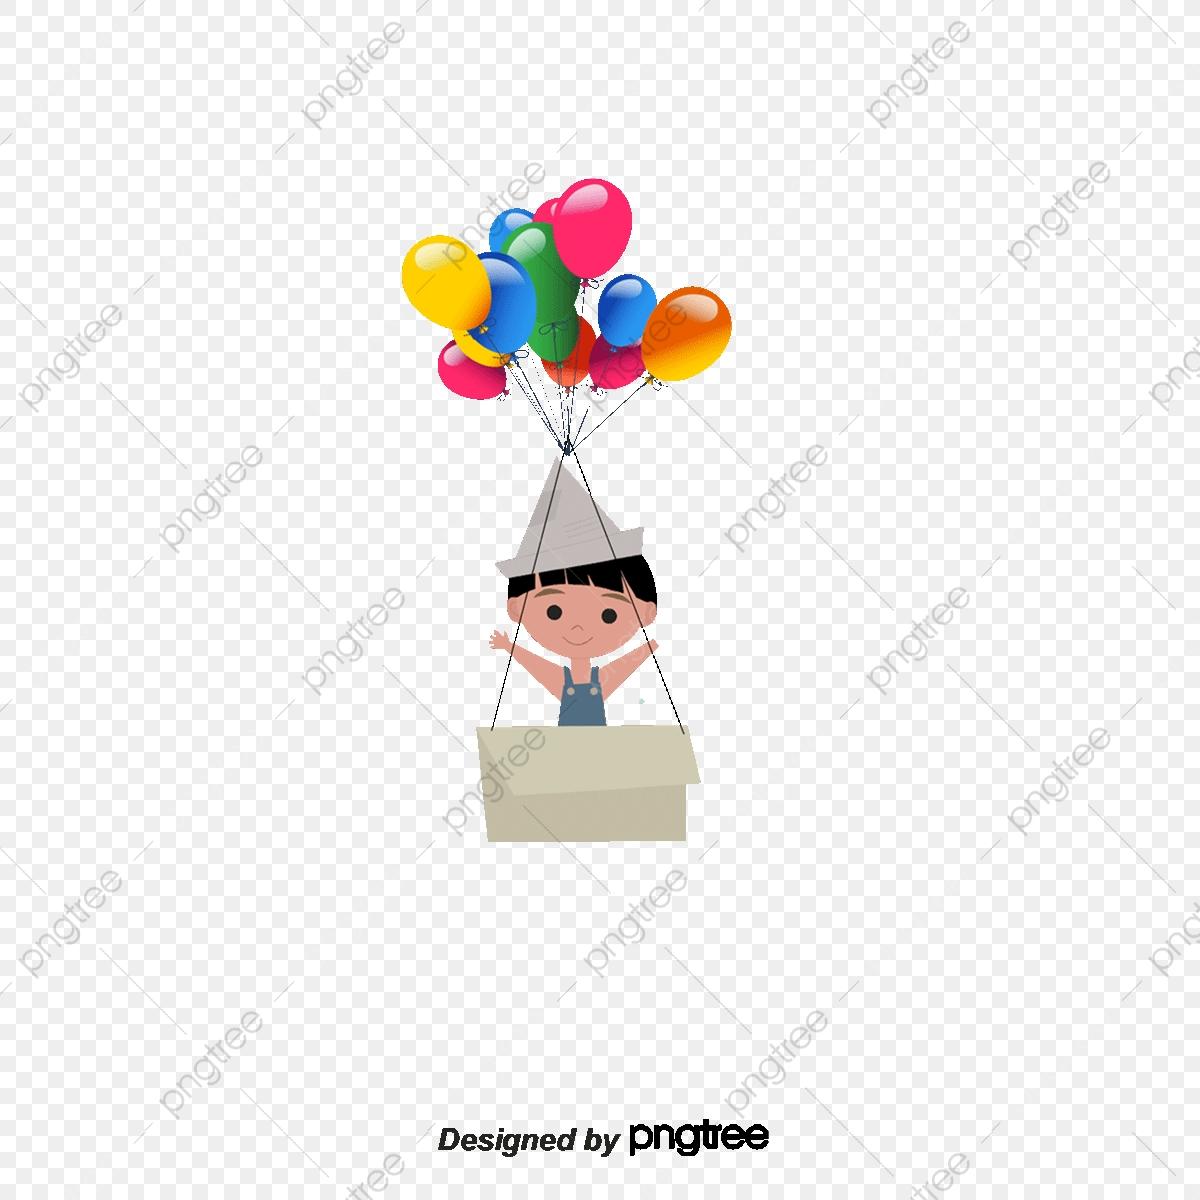 Cartoon Balloons, Balloon, Flowers, Cartoon Elements PNG Transparent.